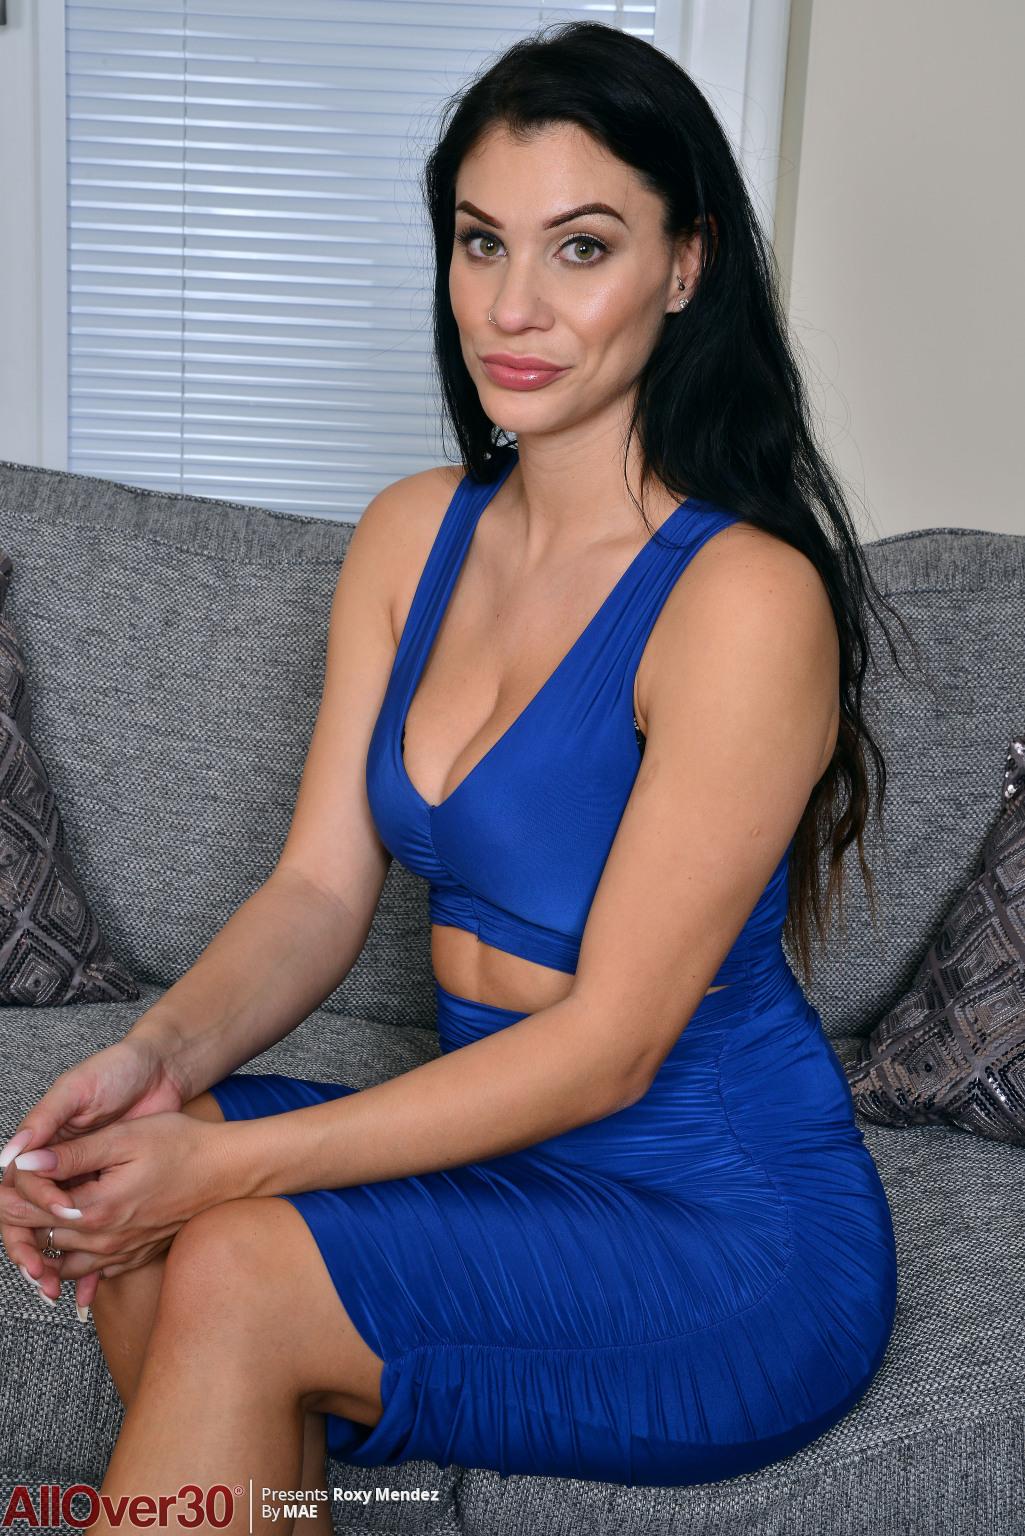 Roxy Mendez from AllOver30